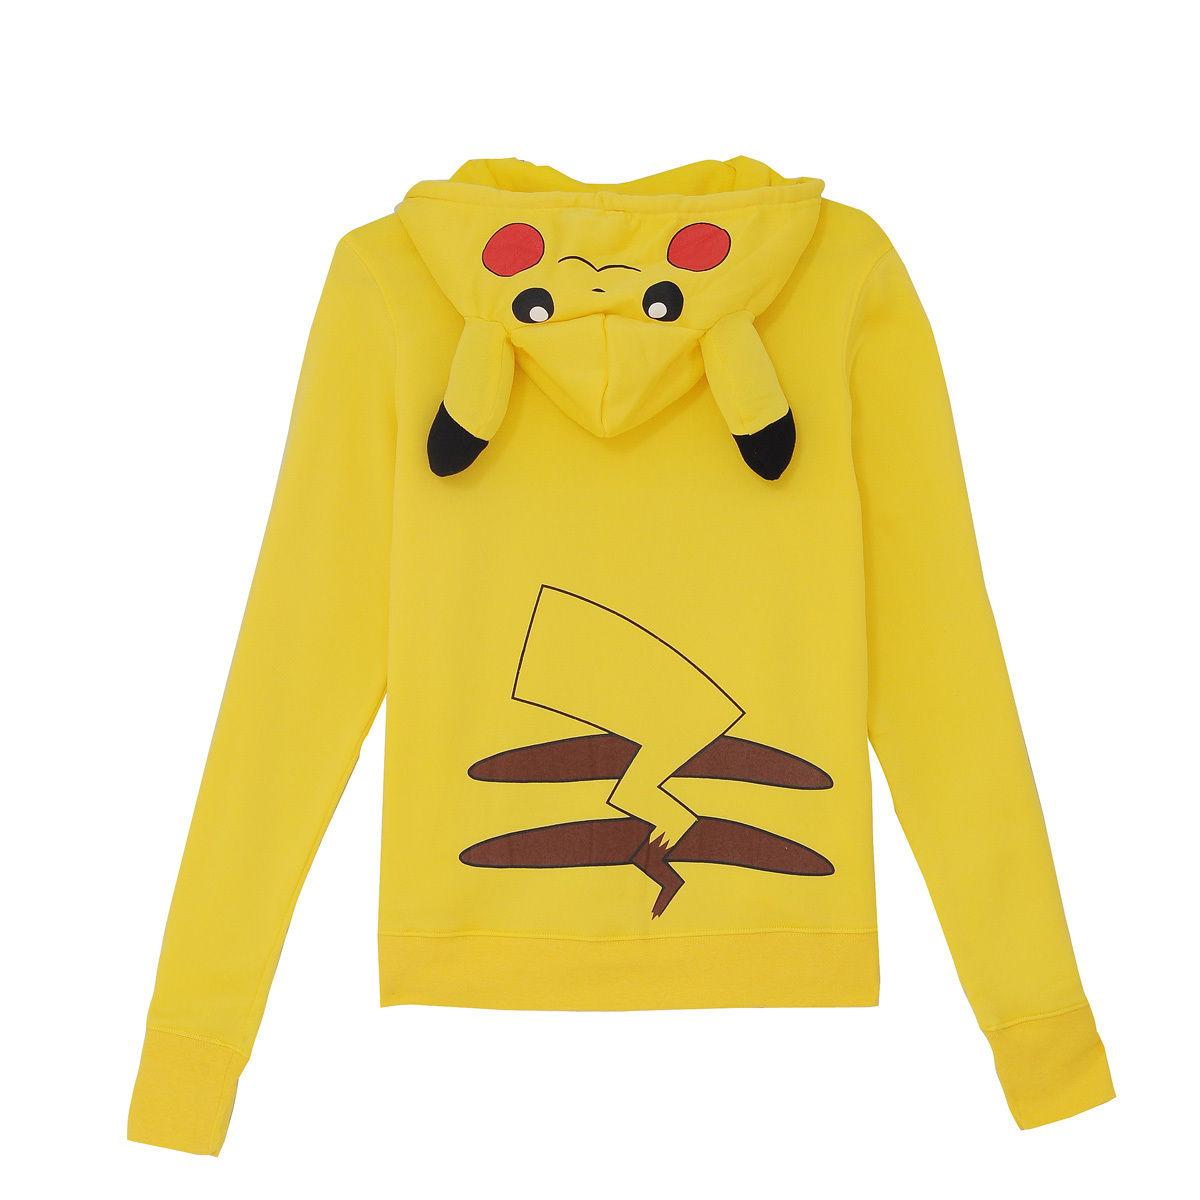 Pokemon Go Anime Pikachu Stitch Zip UP Hoodies Jacket Coat Sweatshirt